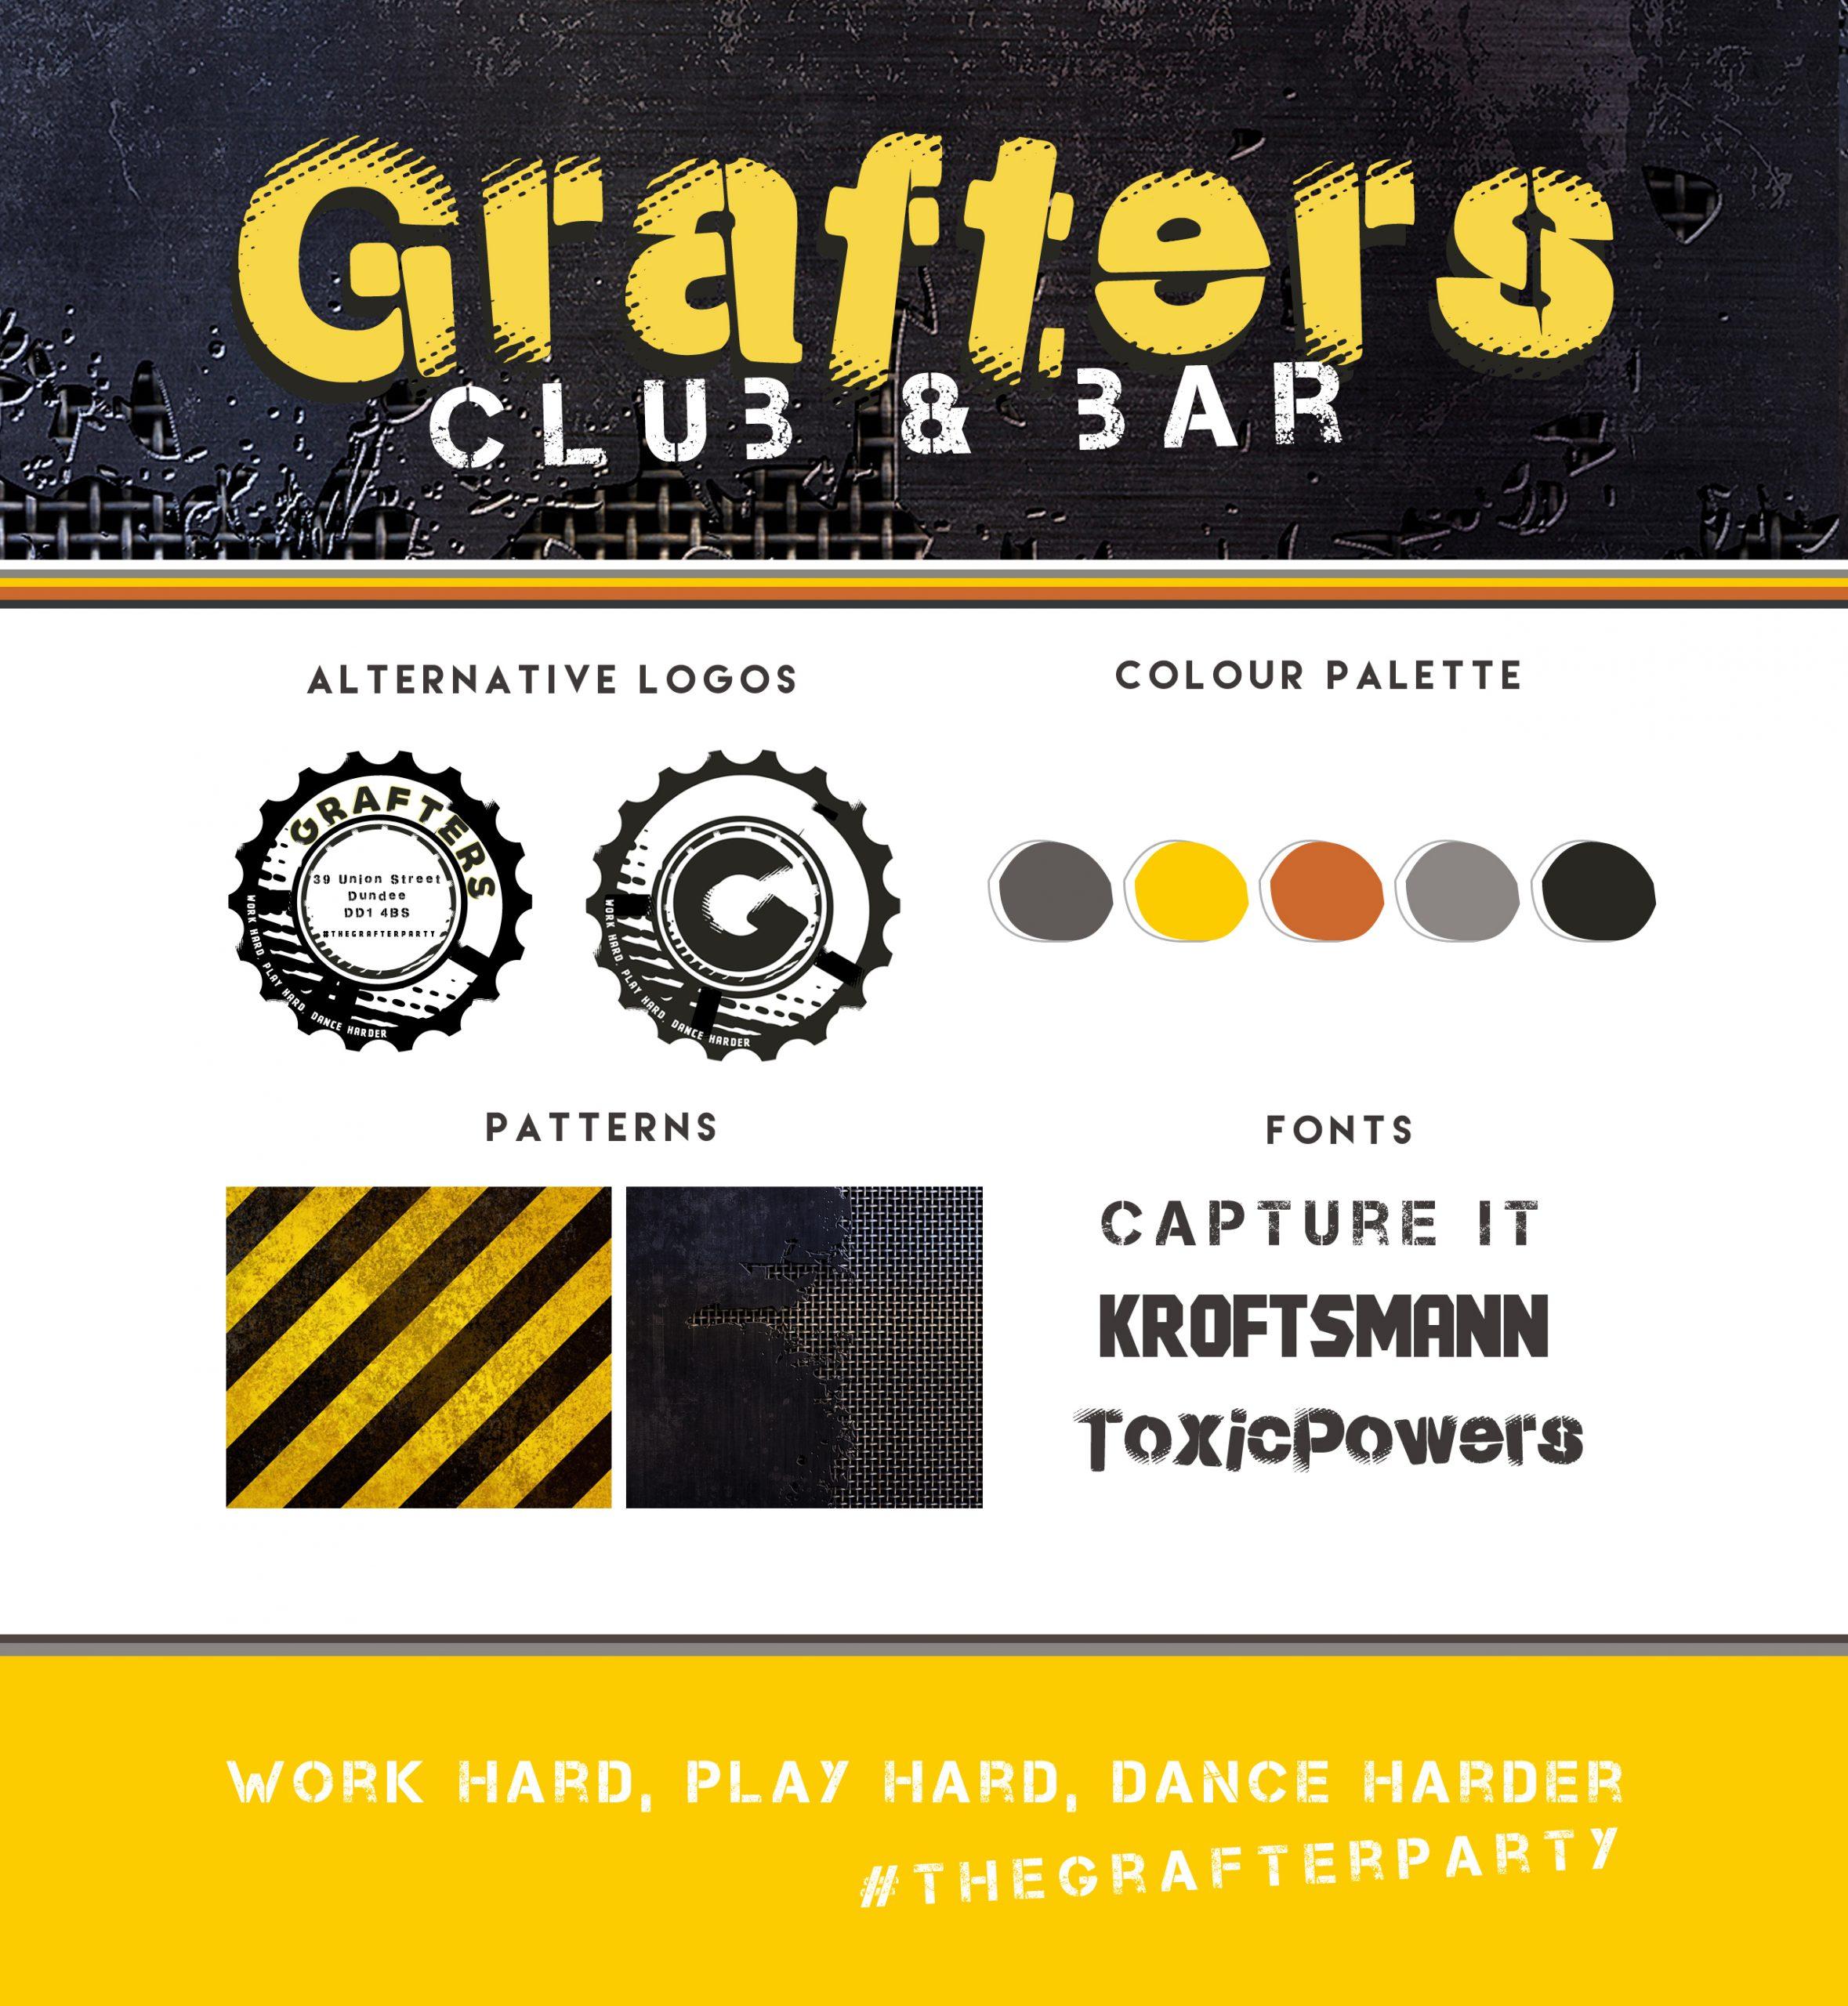 grafters club_branding sheet copy